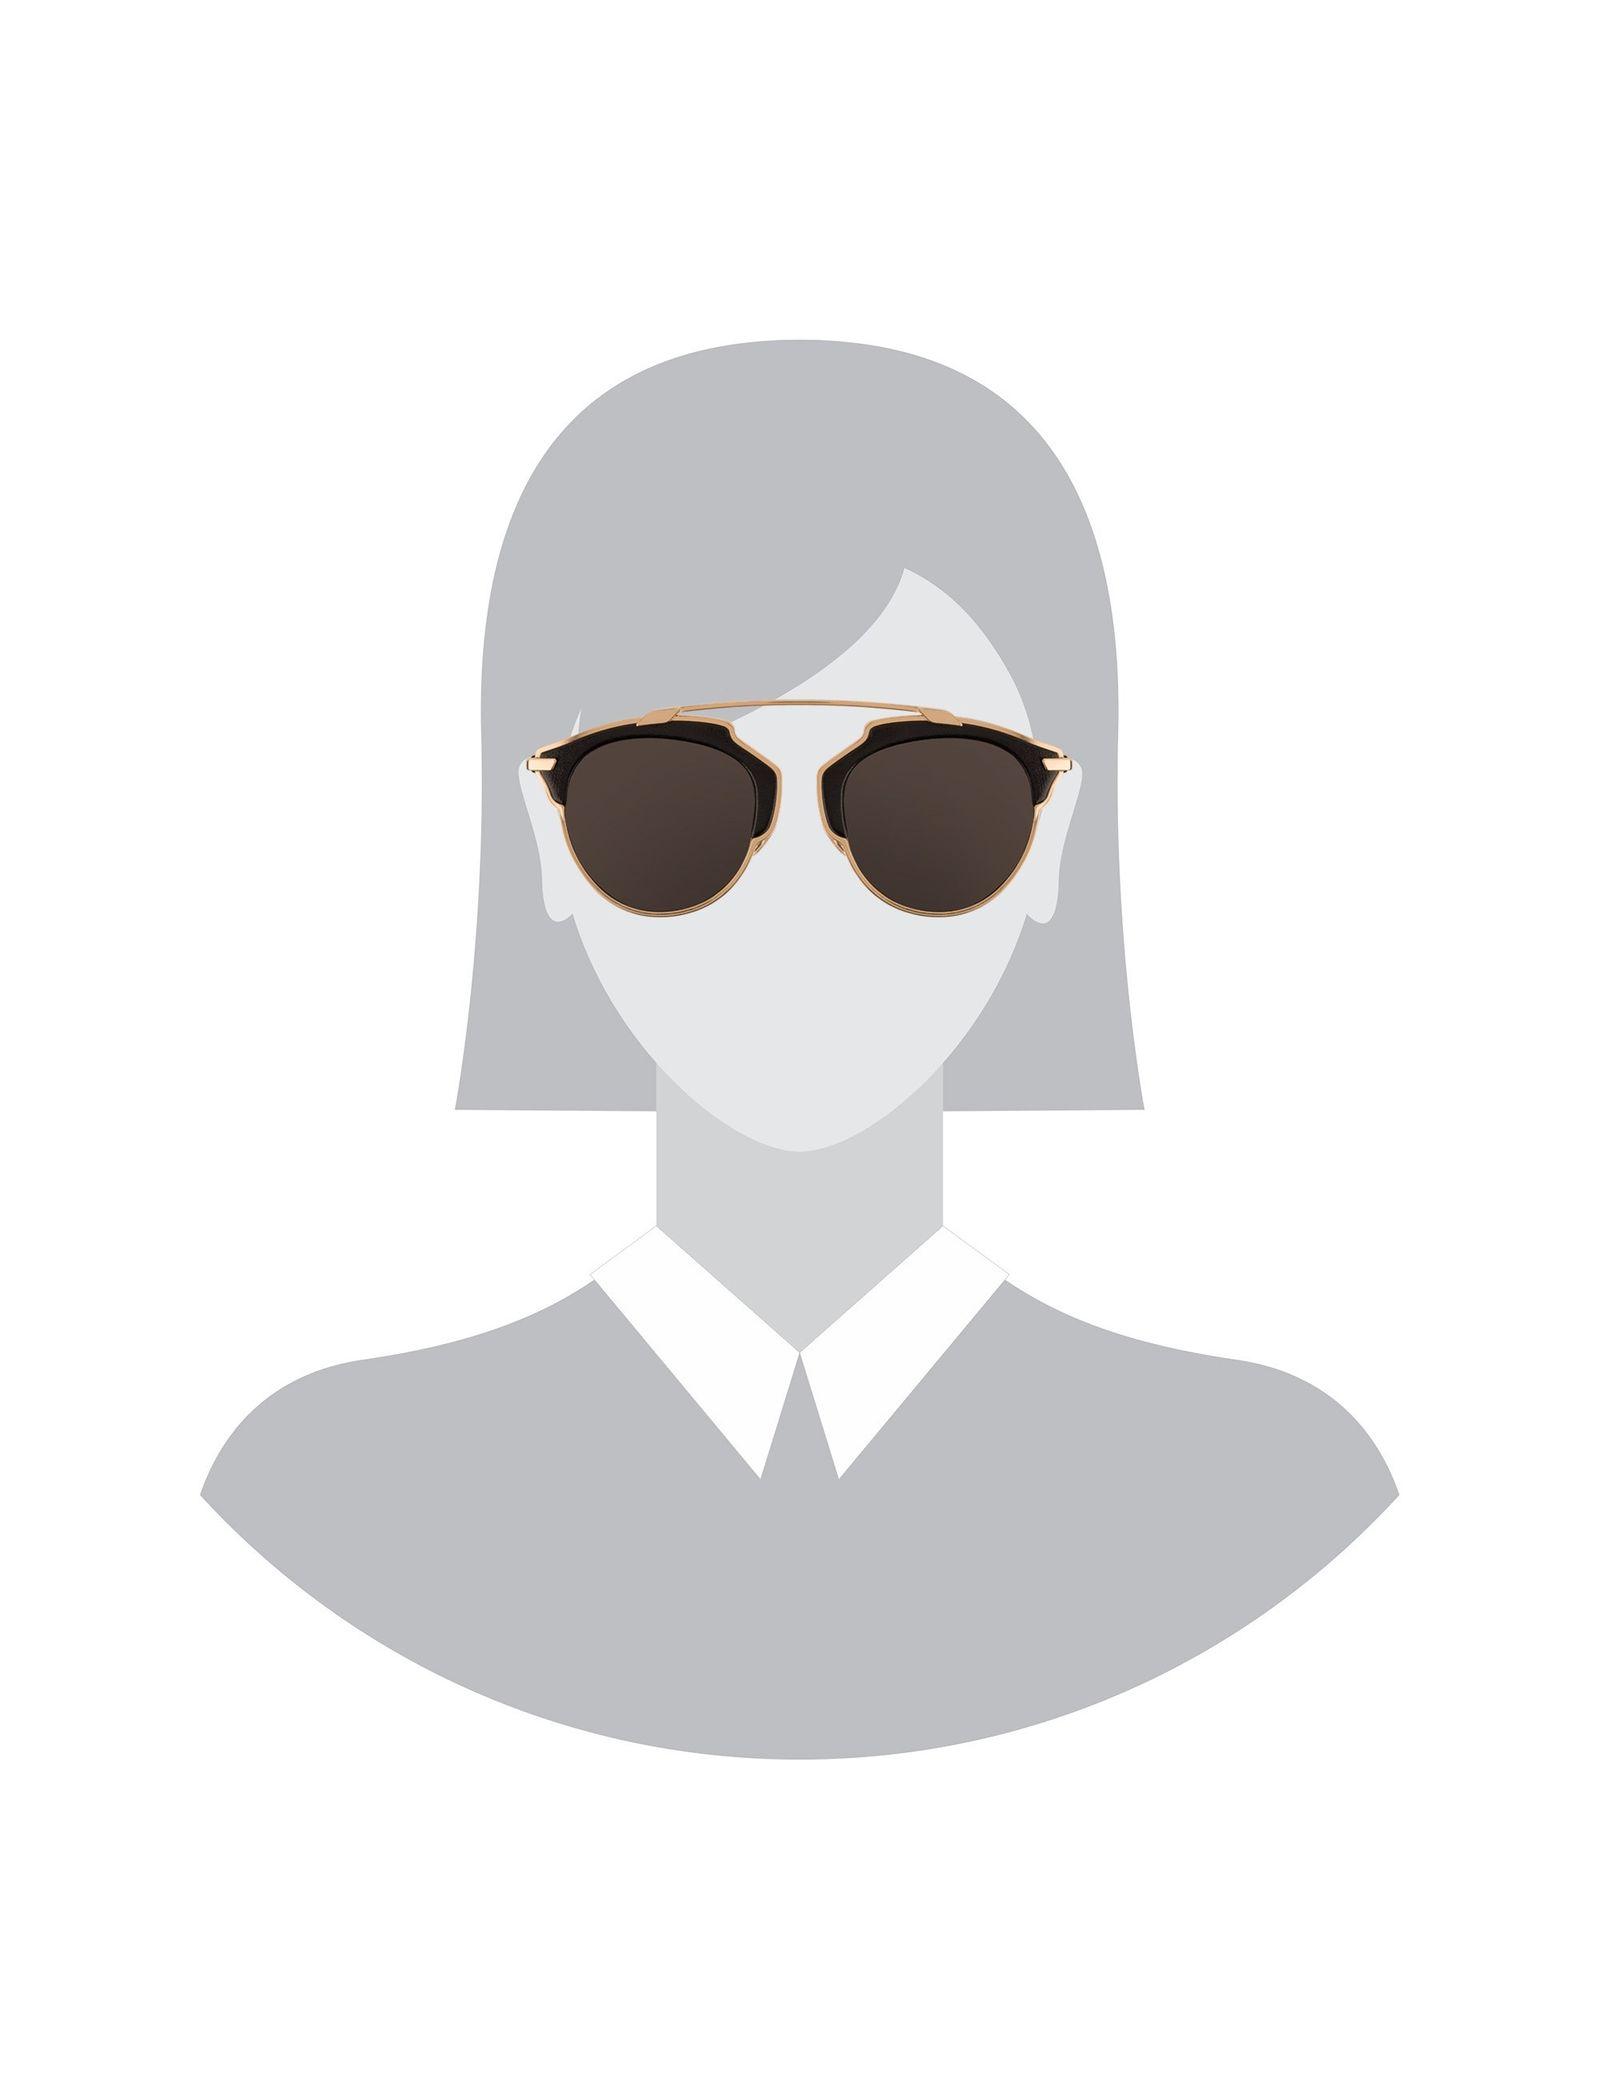 عینک آفتابی پنتوس زنانه - دیور - مشکي و طلايي - 5